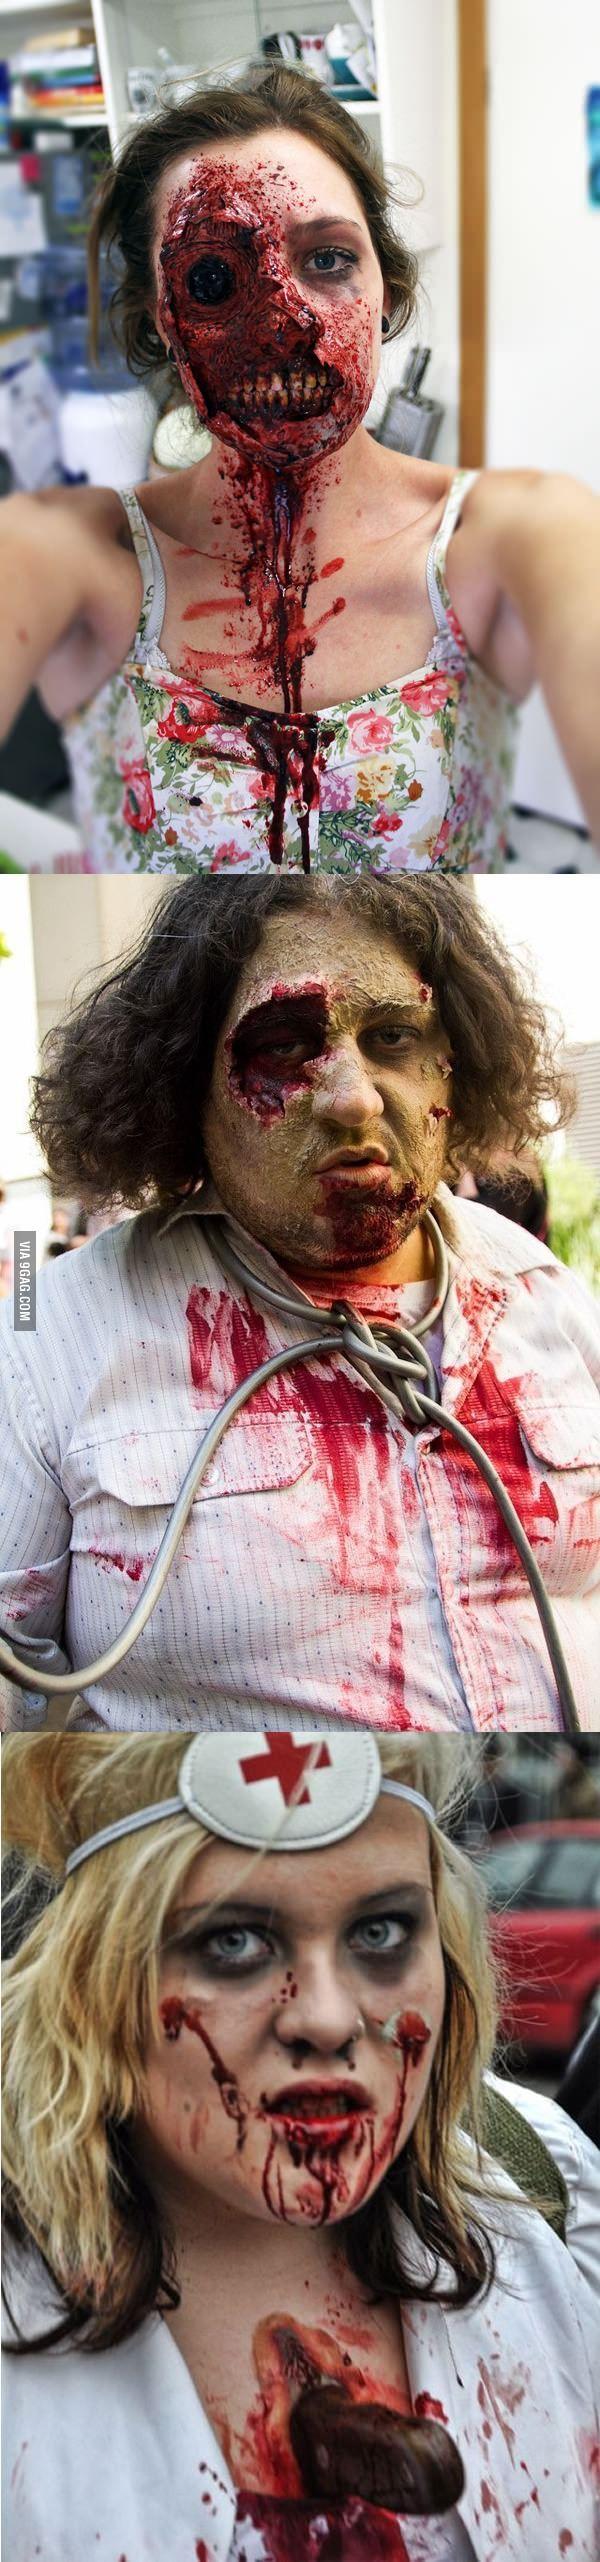 Zombie makeup level: master